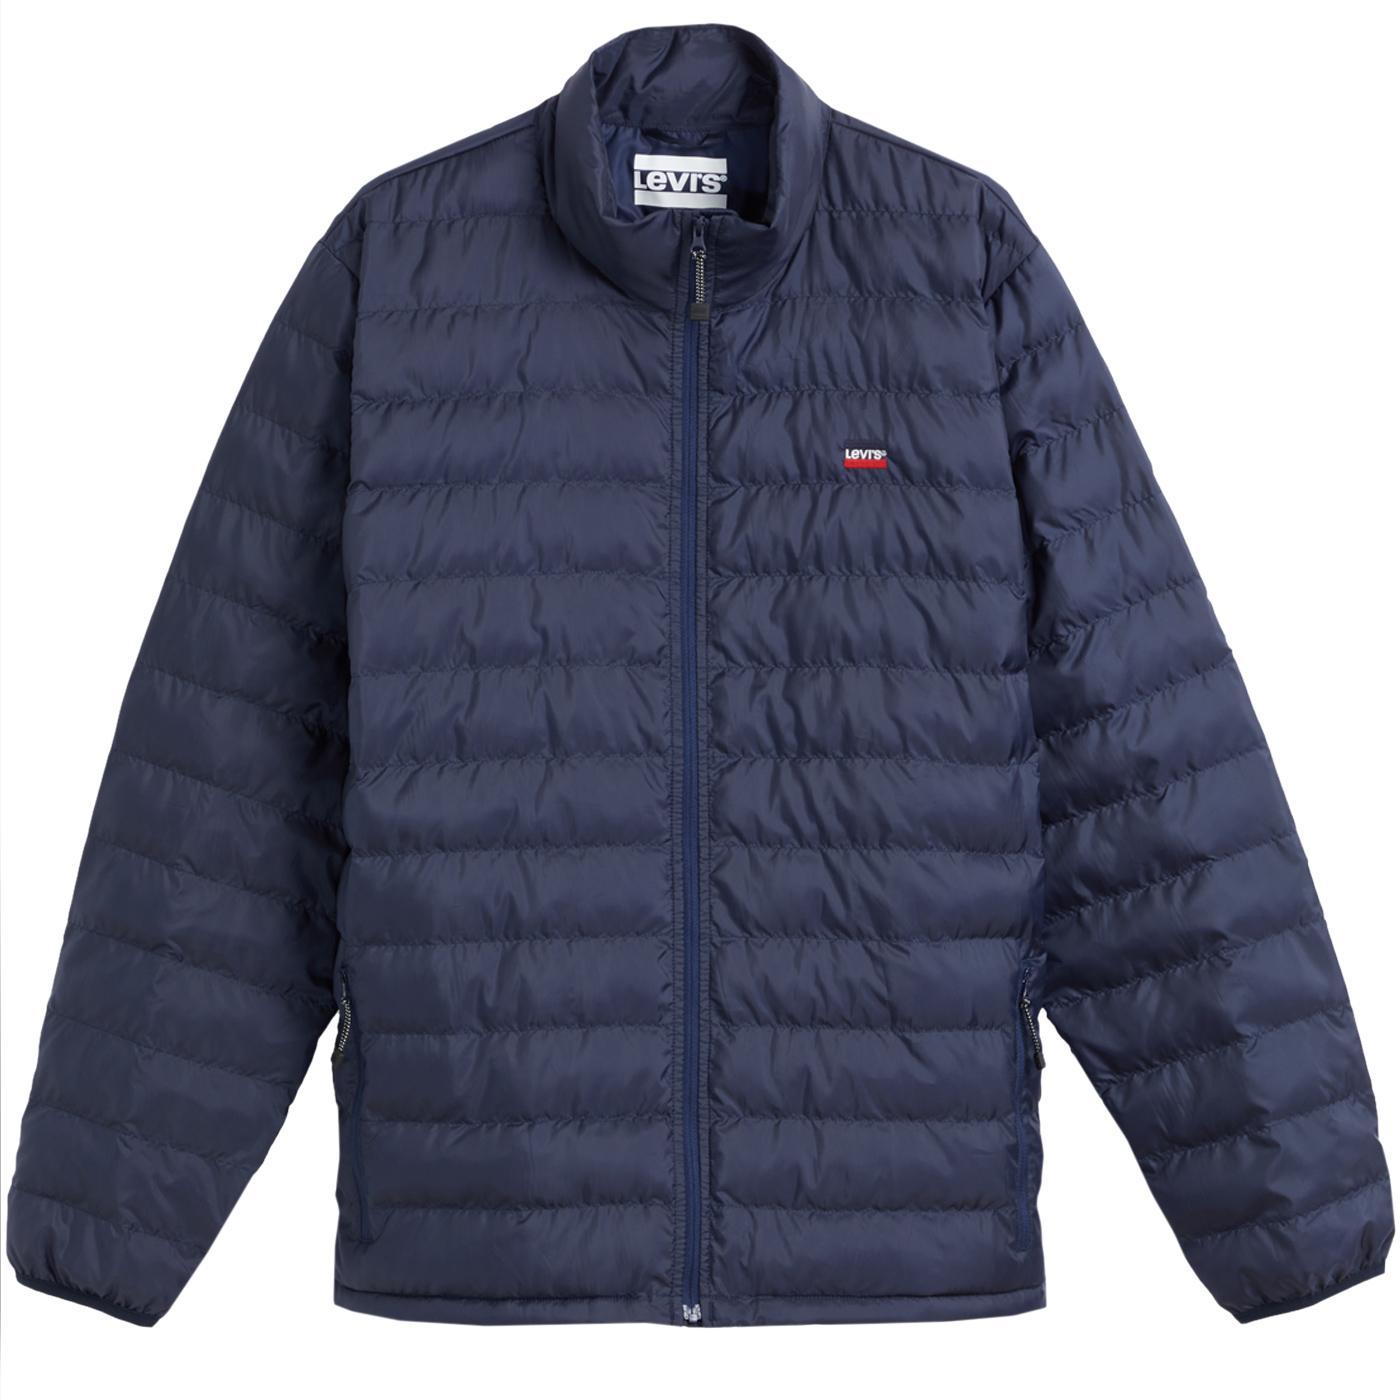 Presidio LEVI'S Retro Quilted Jacket (Peacoat)